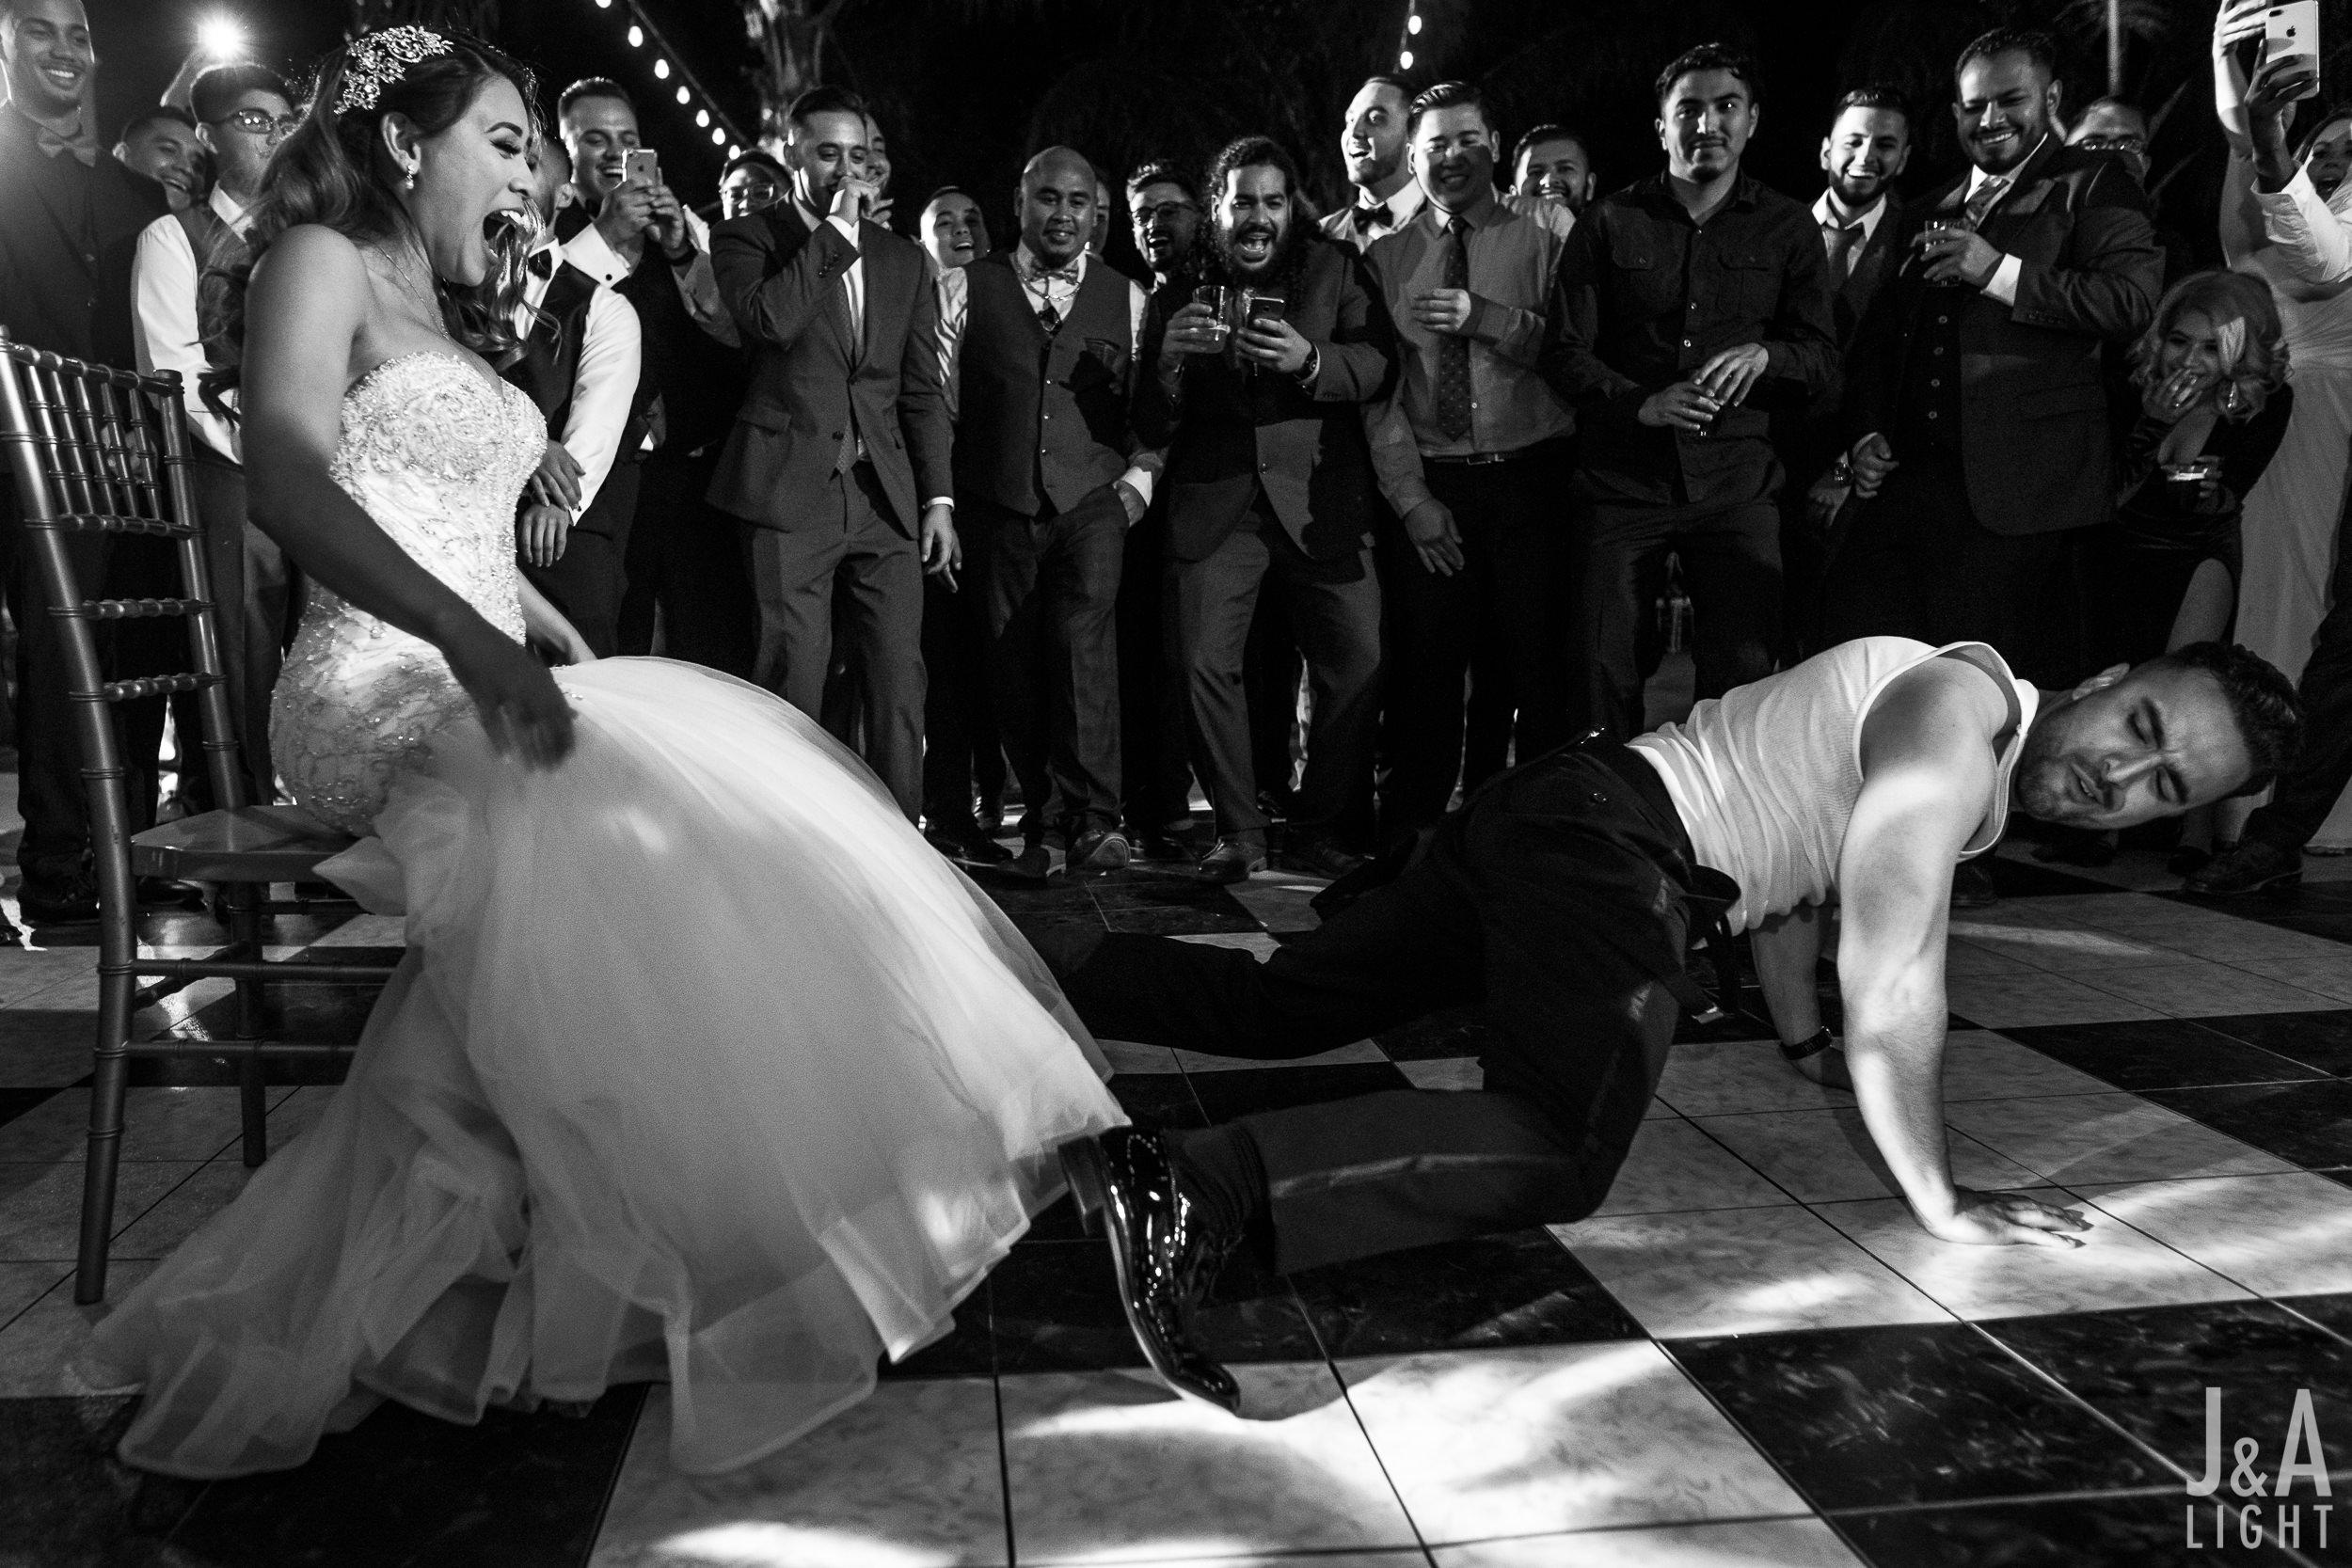 20171014-JanDan-LosBanos-GlassMansion-Wedding-Blog-087.jpg